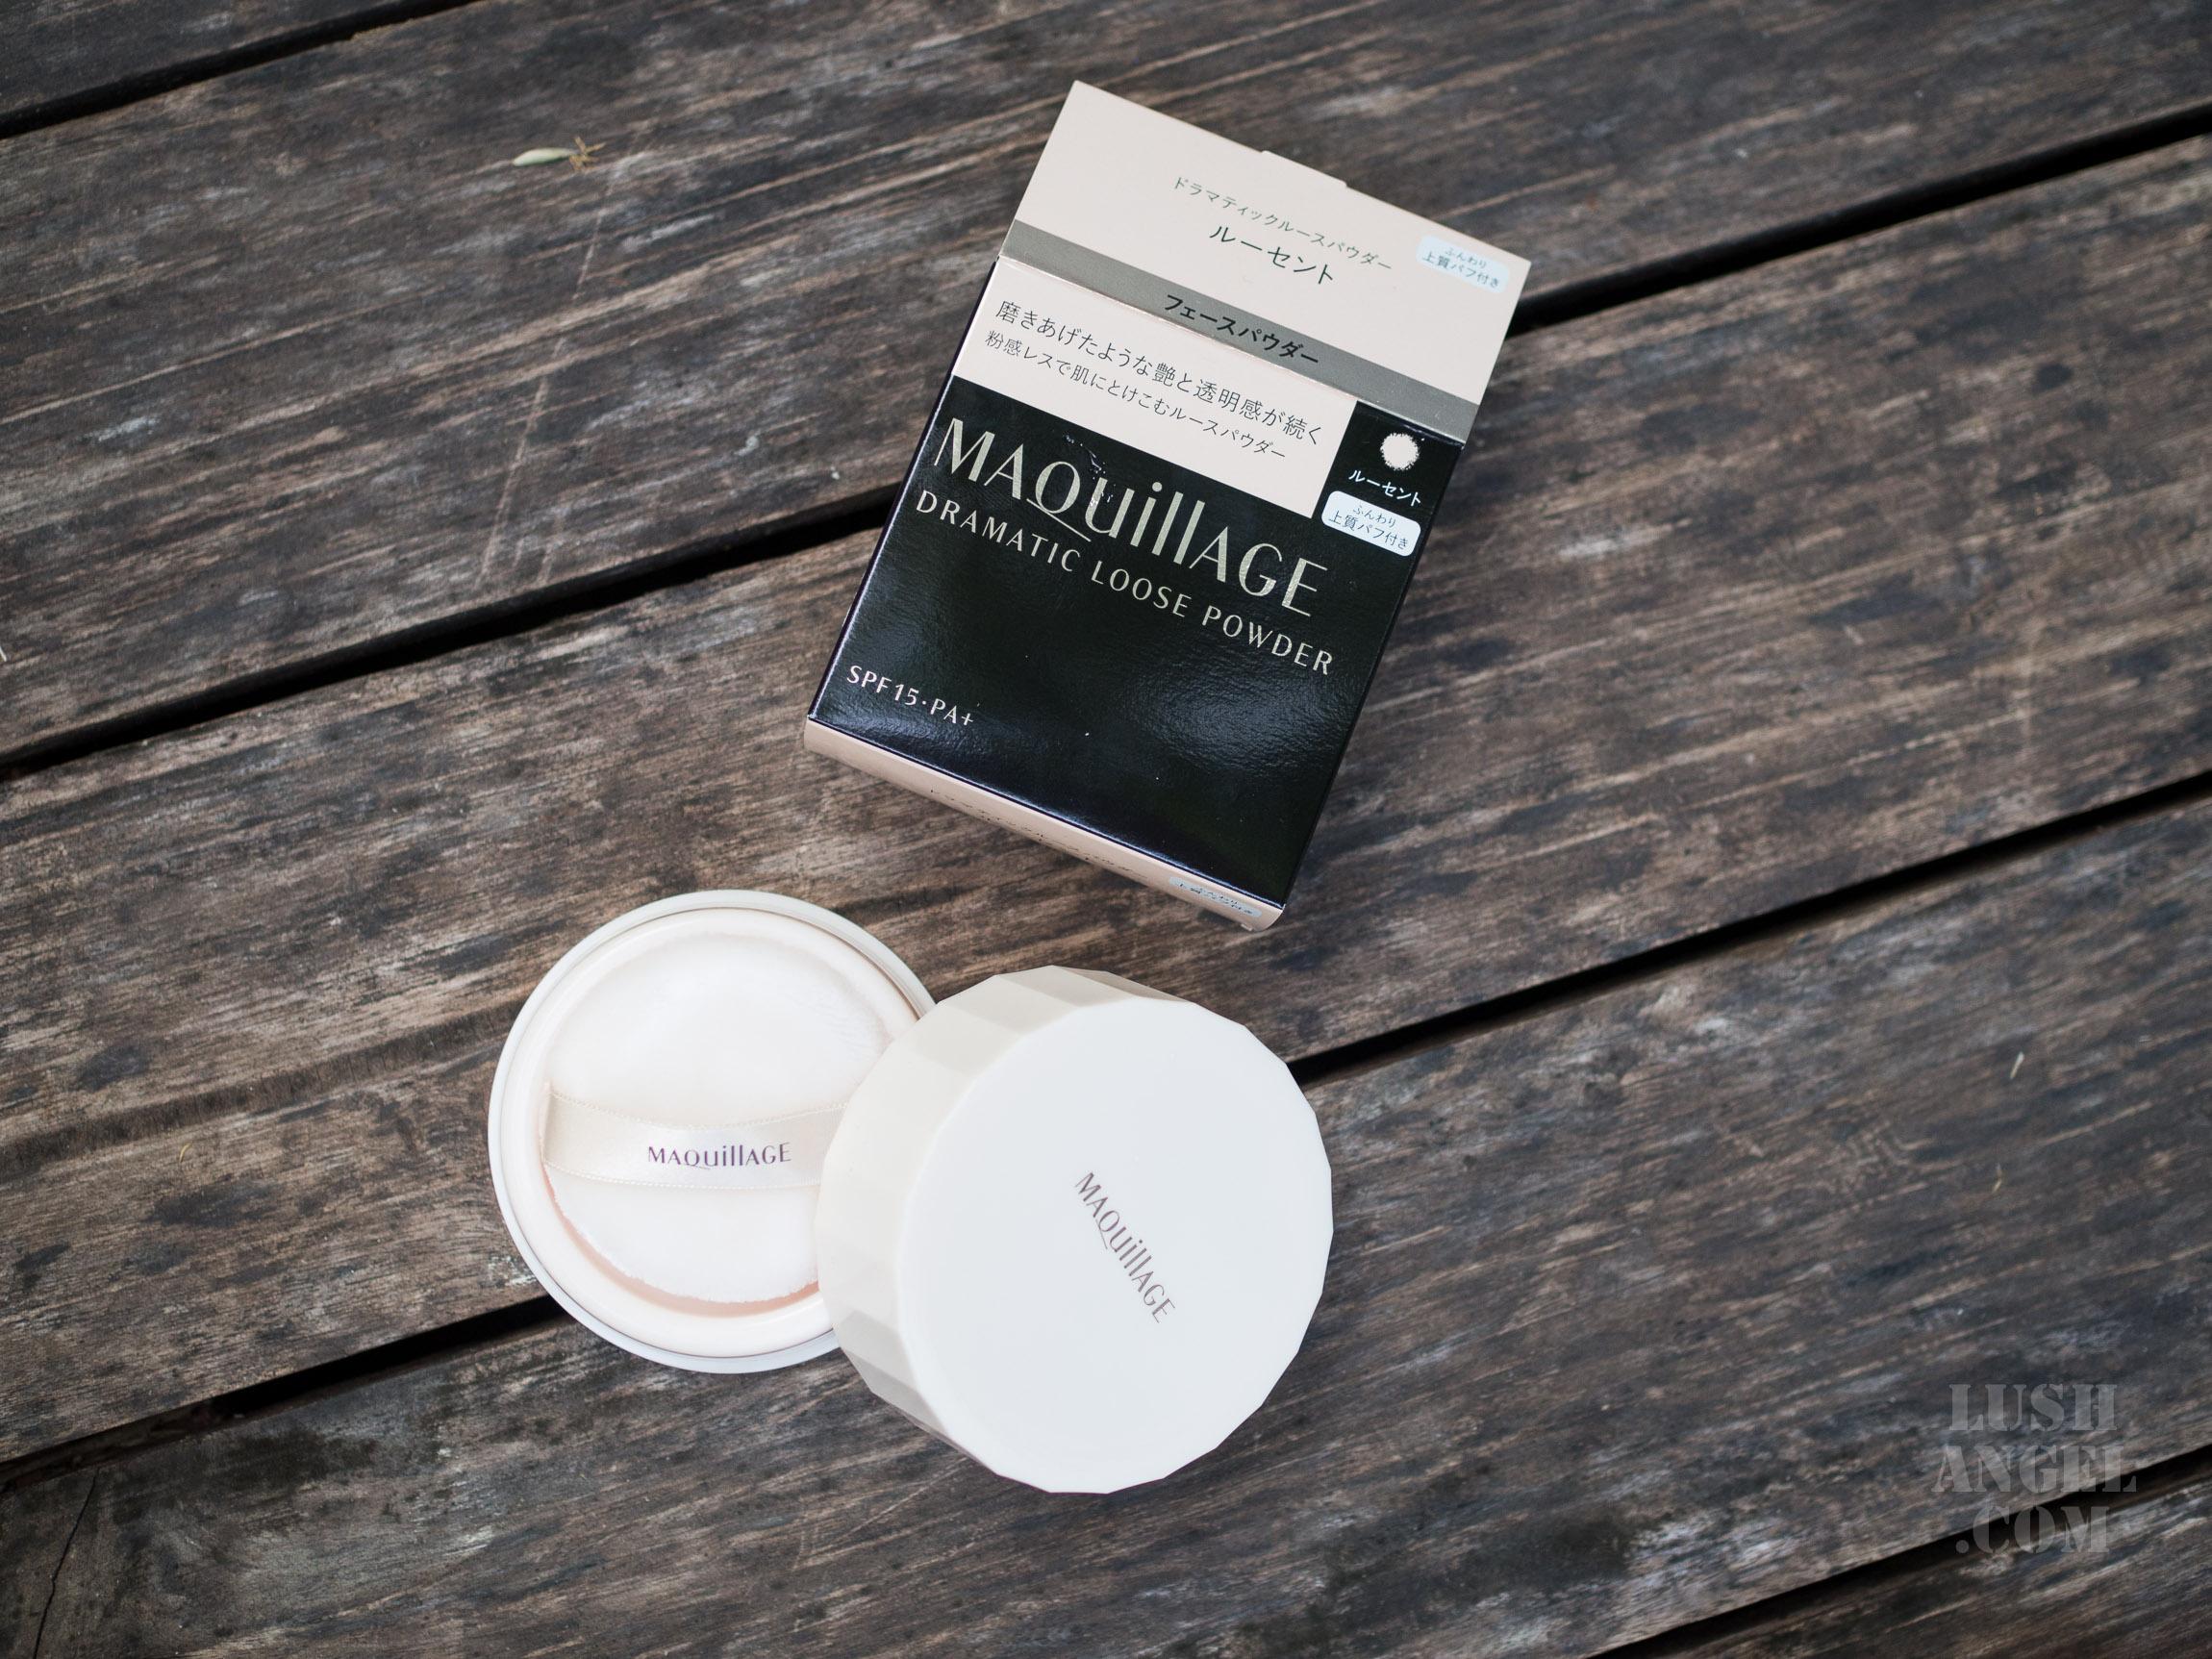 maquillage-loose-powder